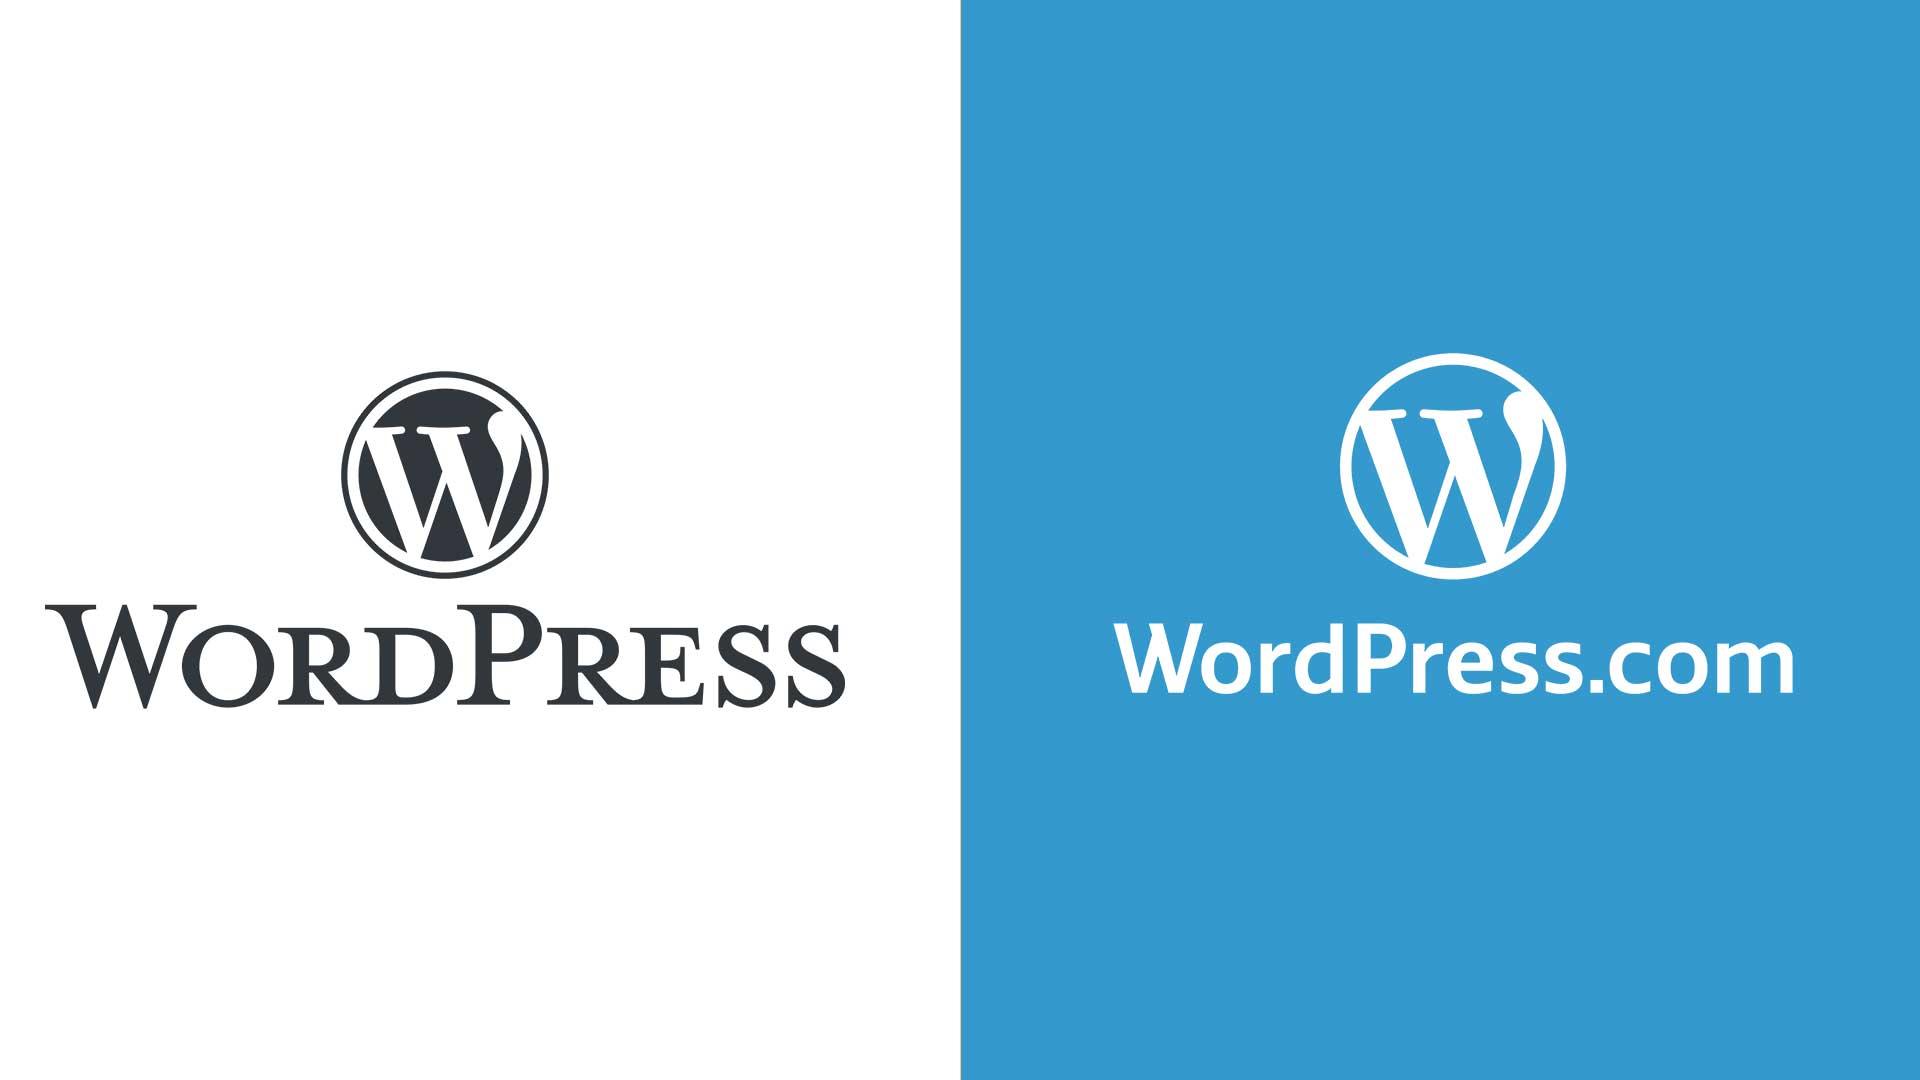 Les différences entre WordPress.com et WordPress.org